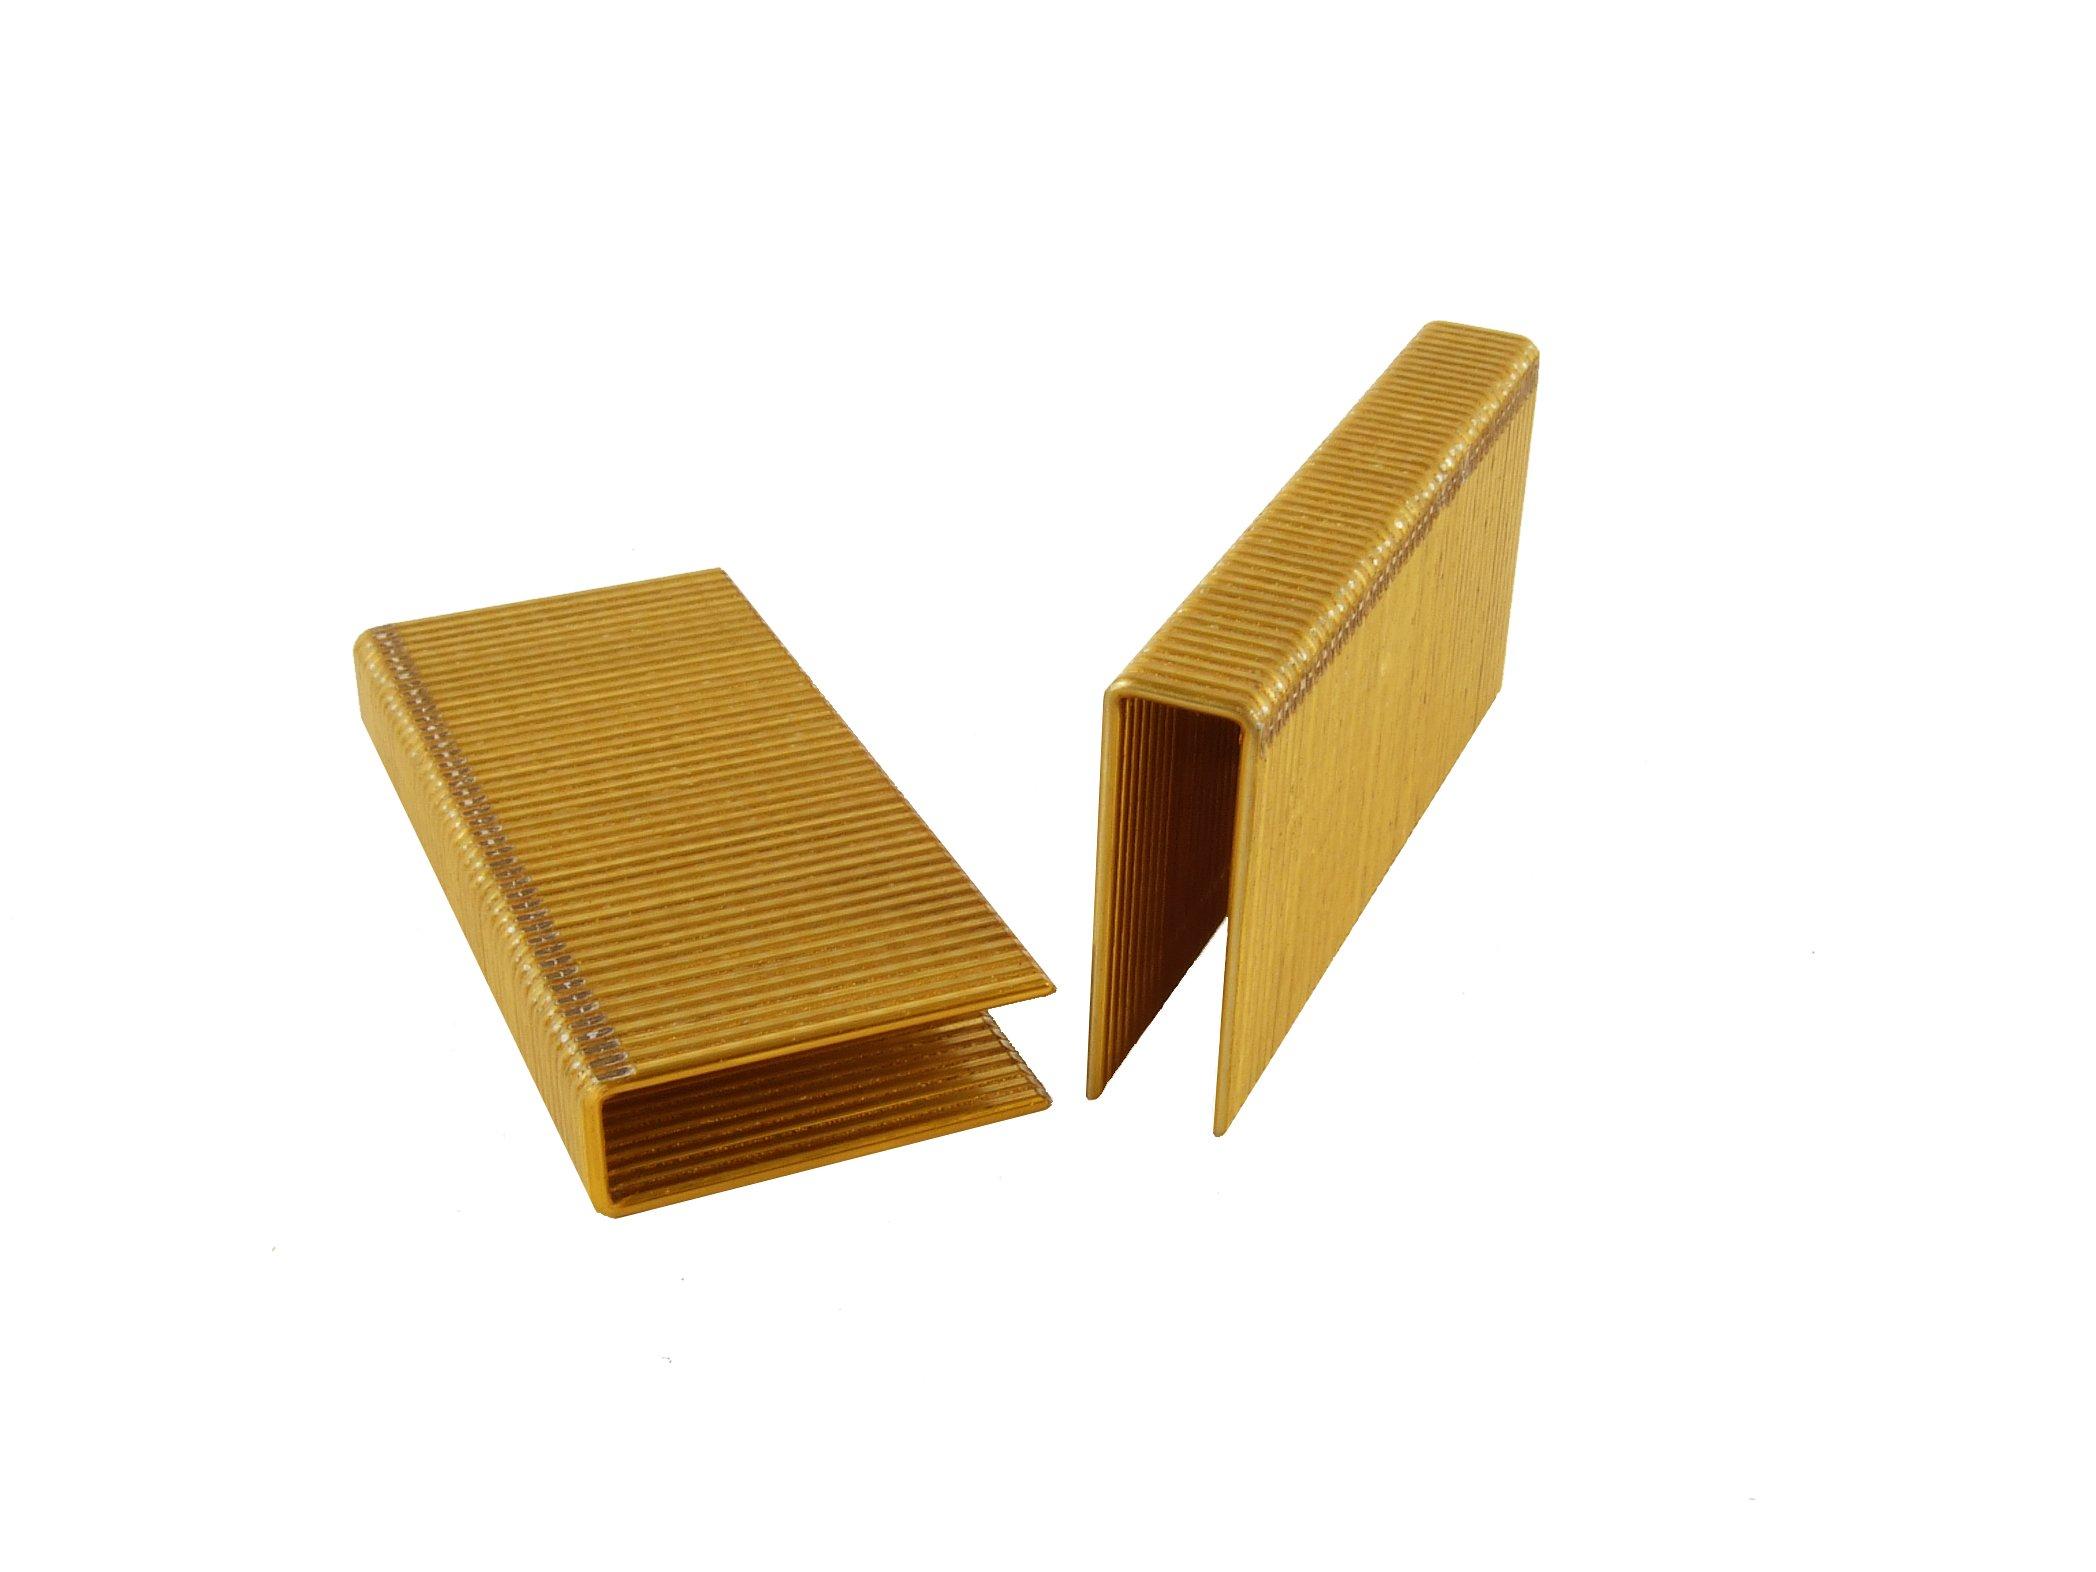 B&C Eagle ABCS-1514 1-3/4-Inch Length x 1/2-Inch Crown x 15 Gauge Galvanized Flooring Staples (1,080 per box)